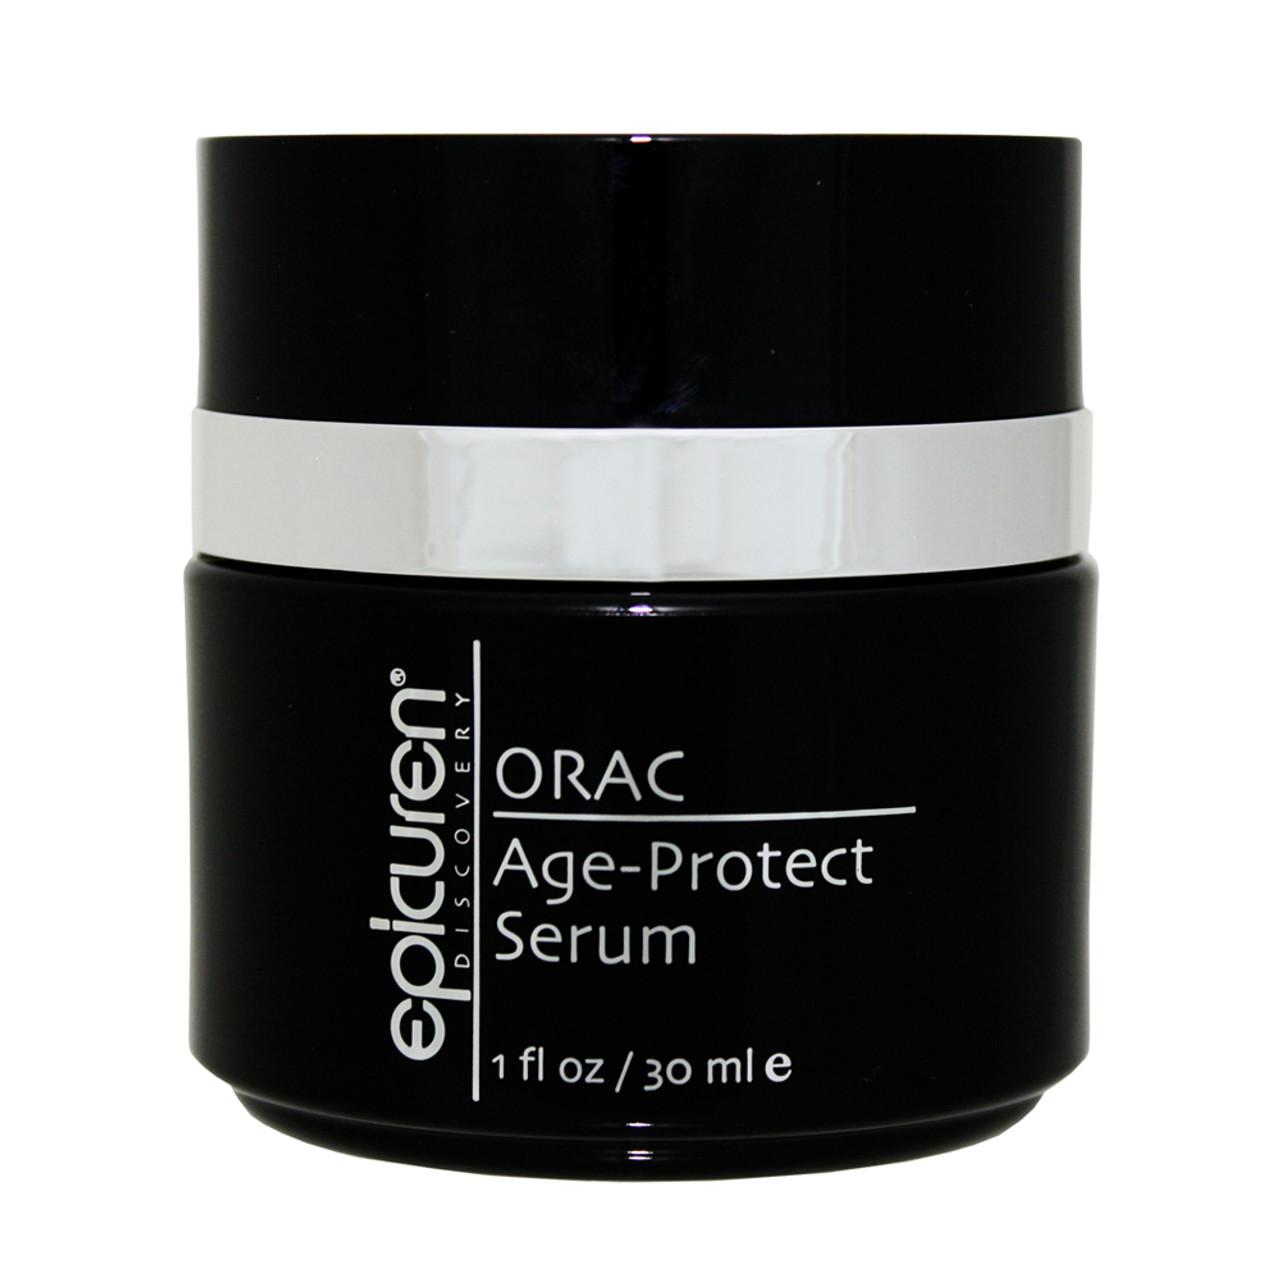 epicuren Discovery ORAC Age-Protect Serum BeautifiedYou.com